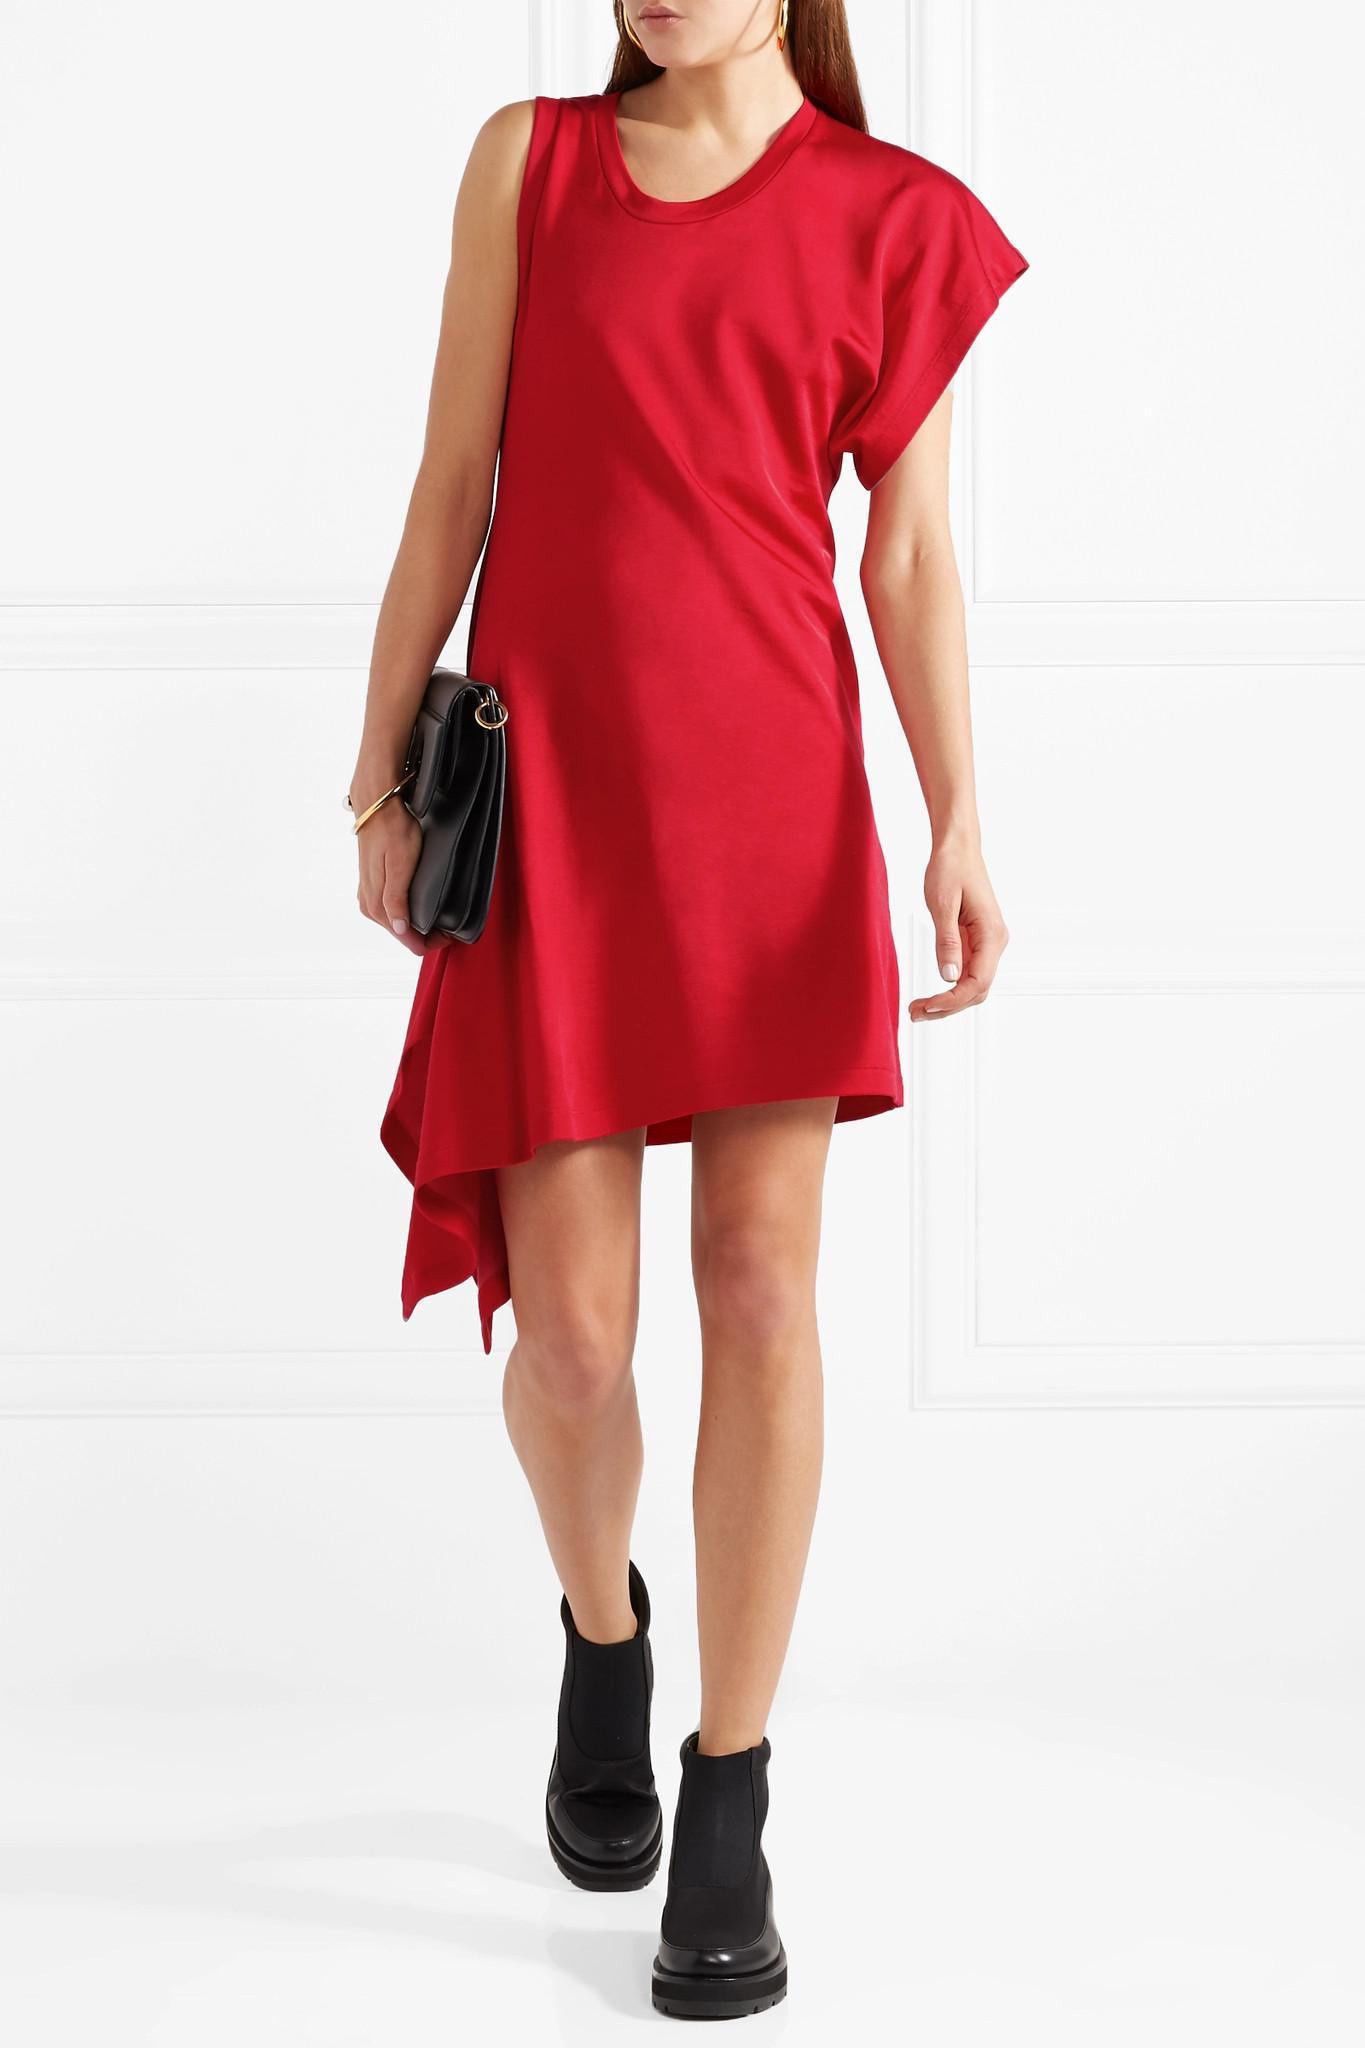 Discount Footlocker Finishline Outlet Online Shop Asymmetric Jersey Mini Dress - Claret Maison Martin Margiela JRjf4eCh